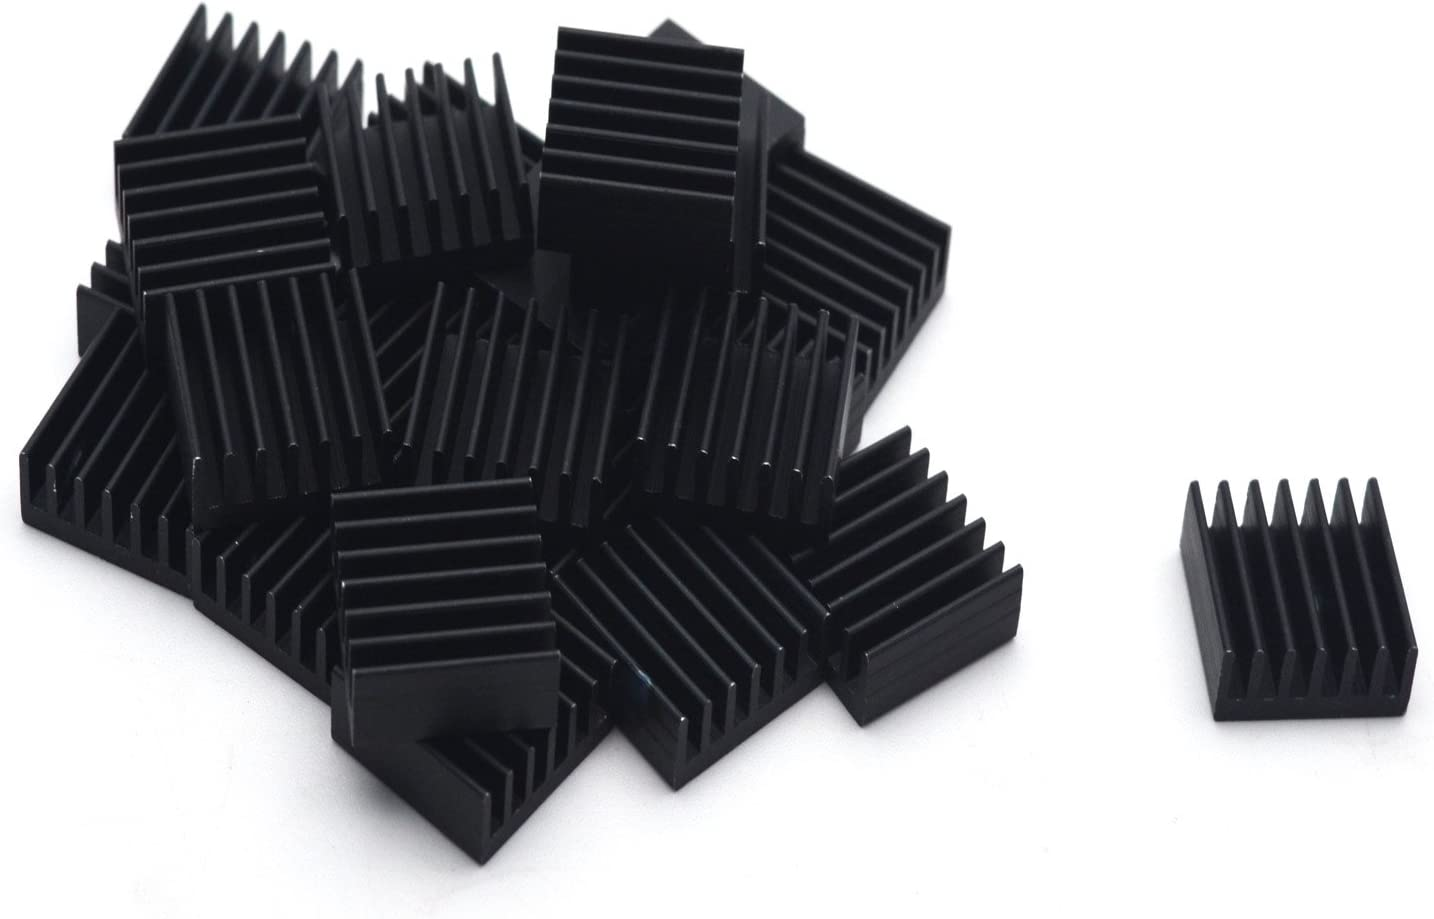 Antrader 24-Pack Aluminum Heatsink Heat Sink Cooling Fin 14mm x 14mm x 6mm, Black